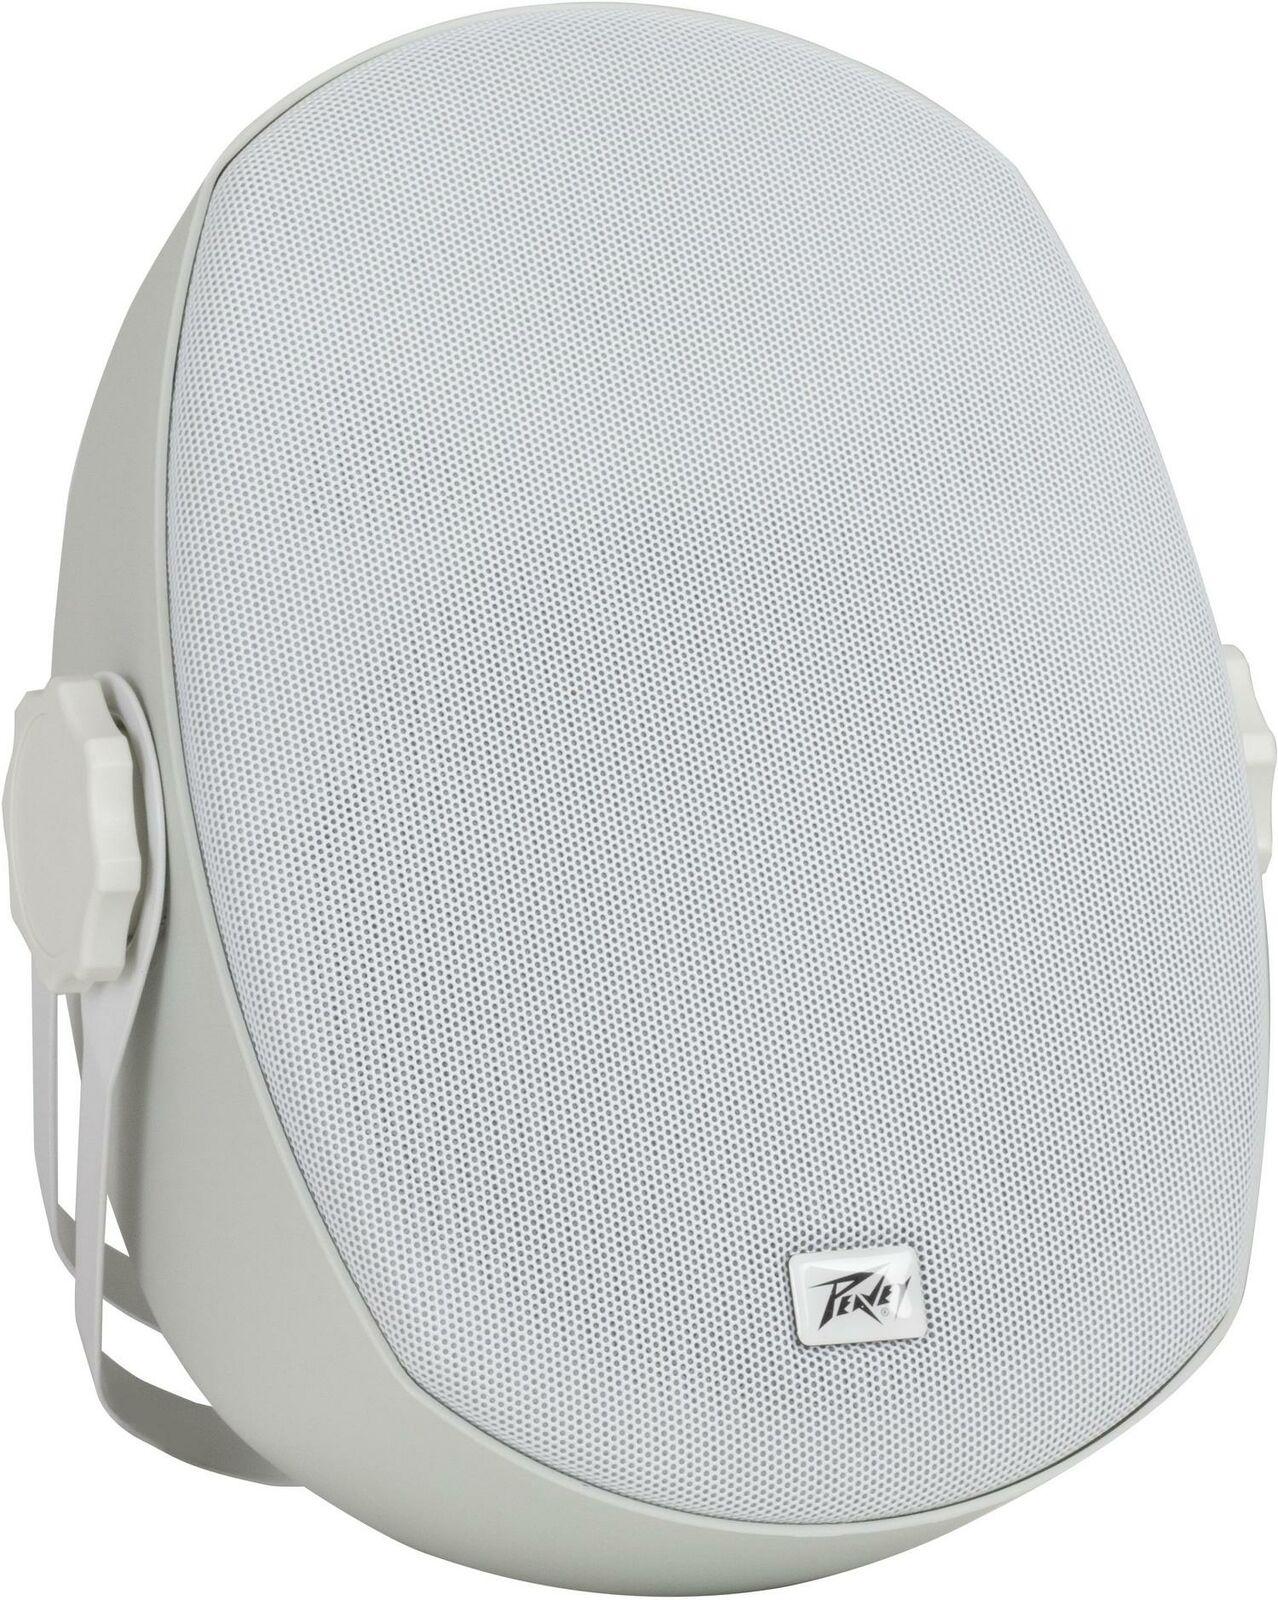 Peavey Impulse Impulse Impulse 8c Pro Audio 8  resistente a la intemperie 2-Way Pasivo Altavoz 70W blancoo bdf6dc